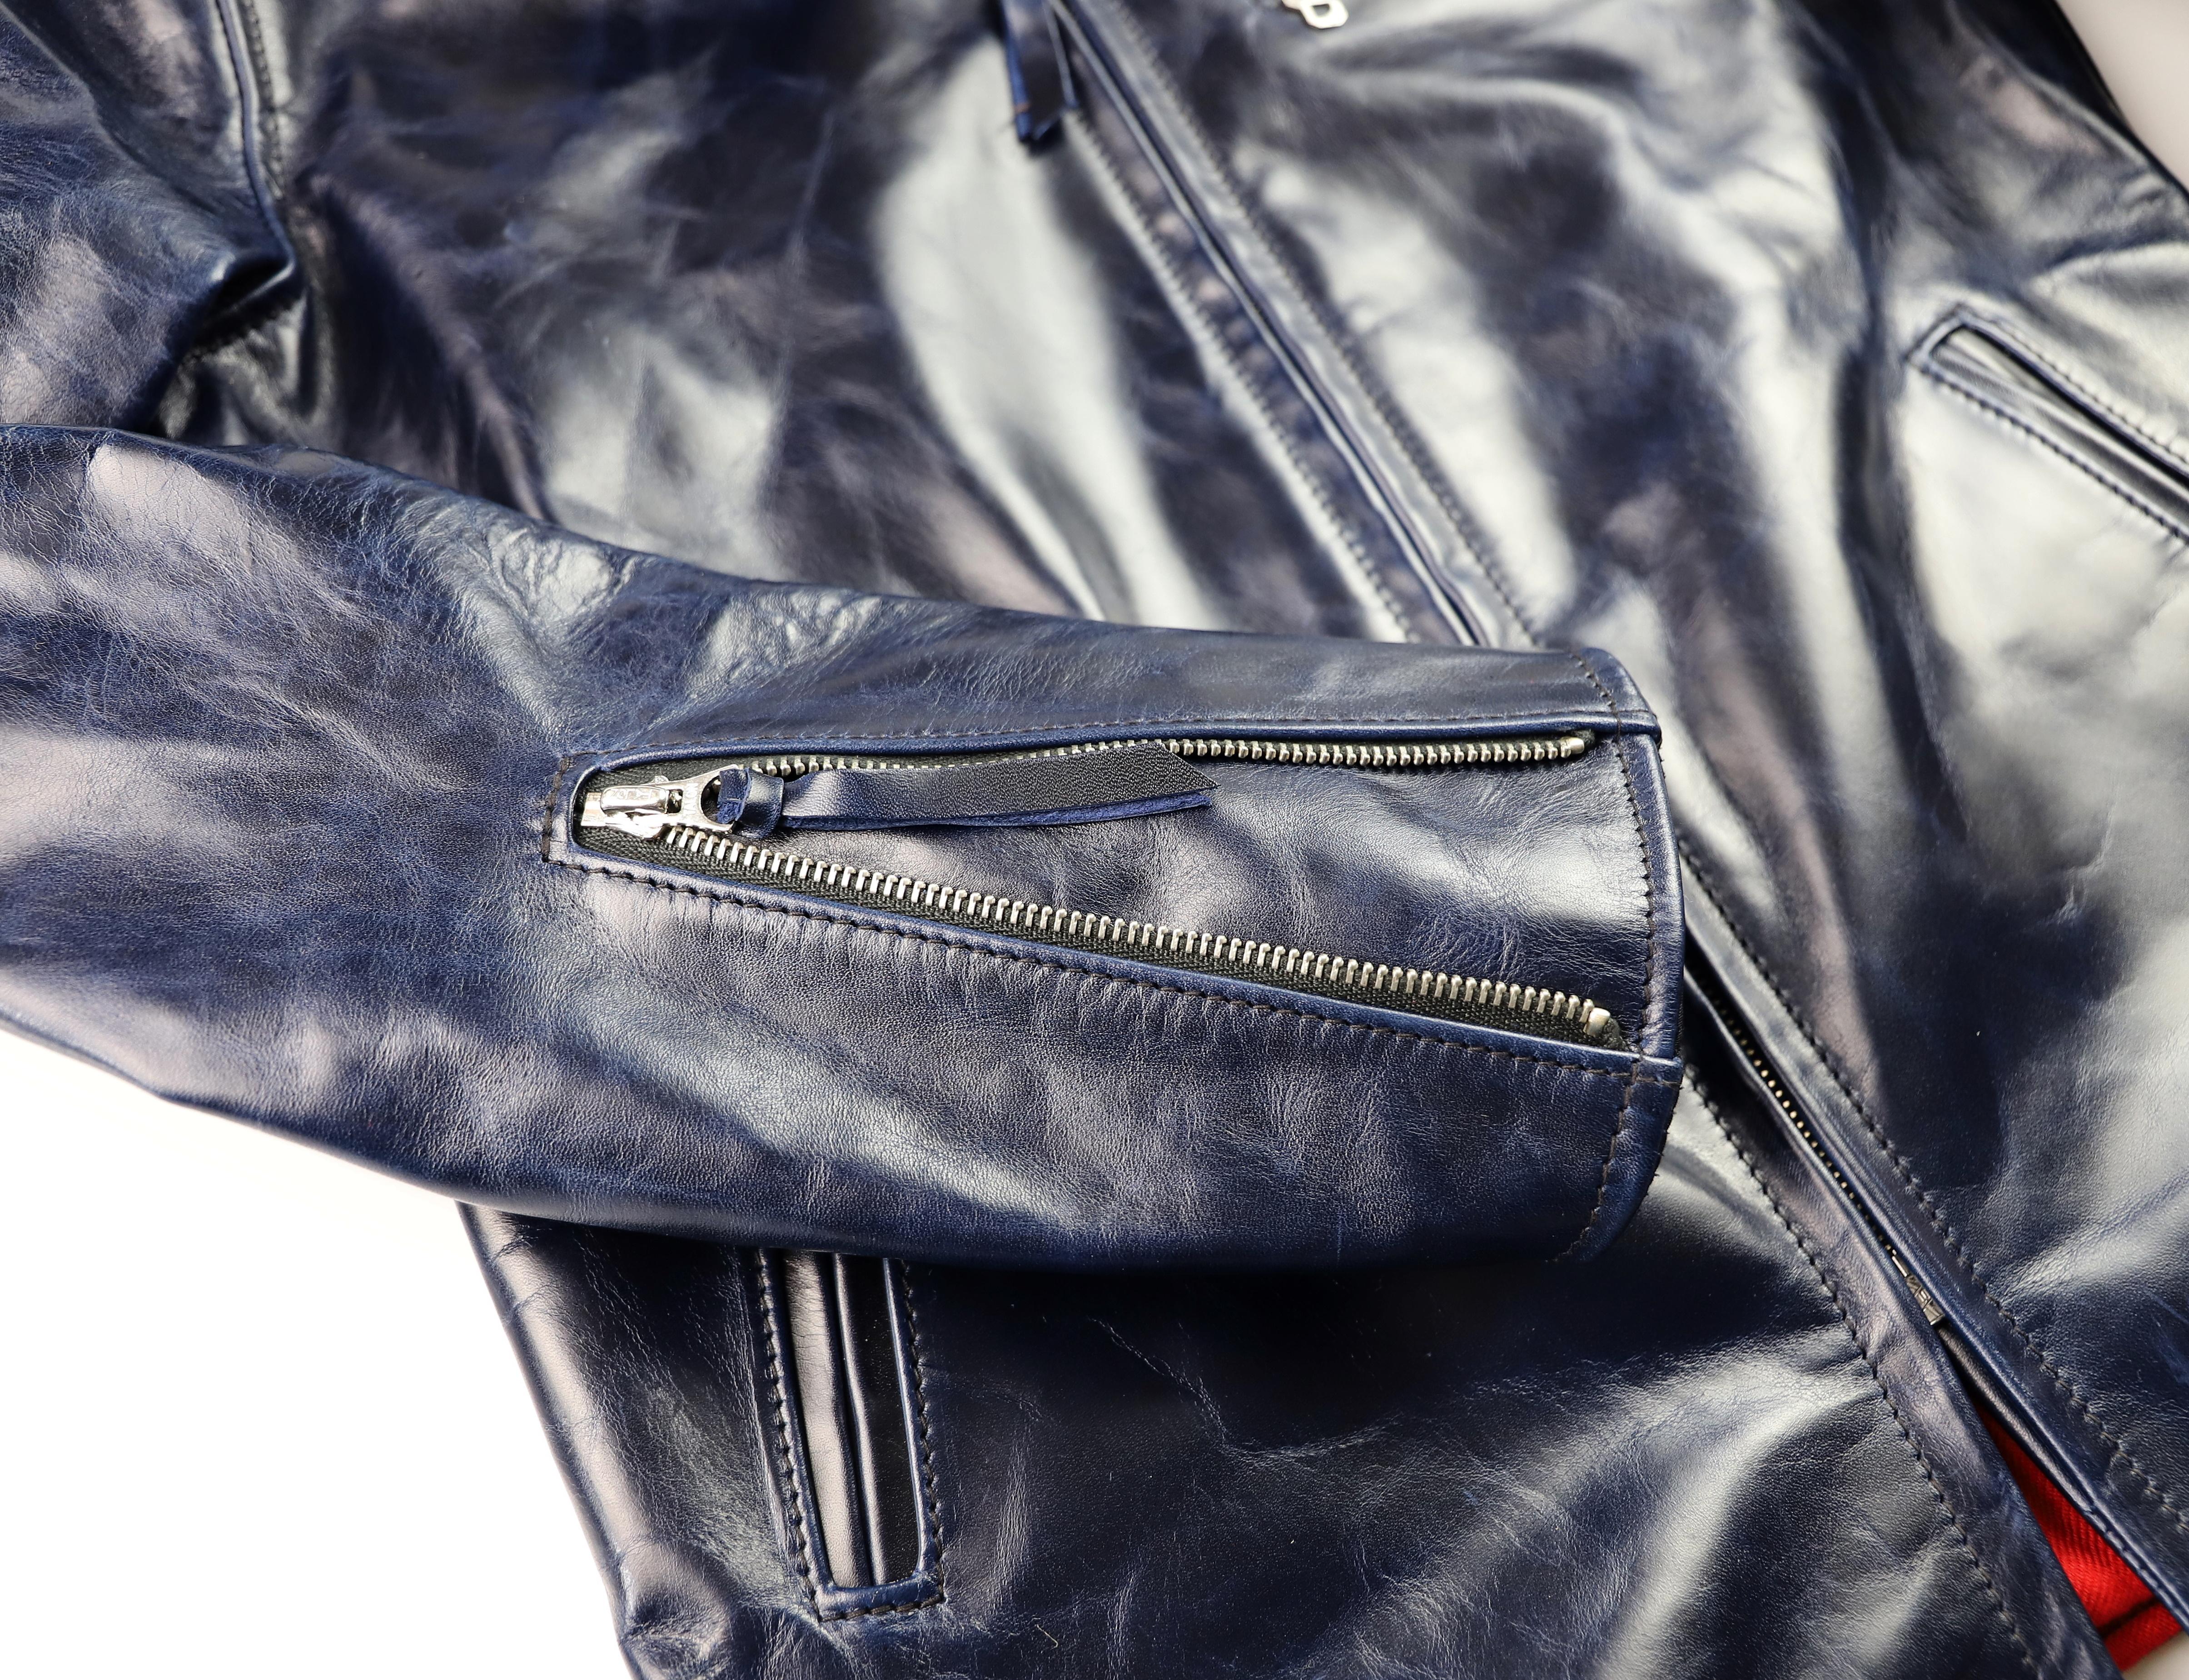 Aero Seven Abyss Blue Bainbridge sleeve zipper.jpg